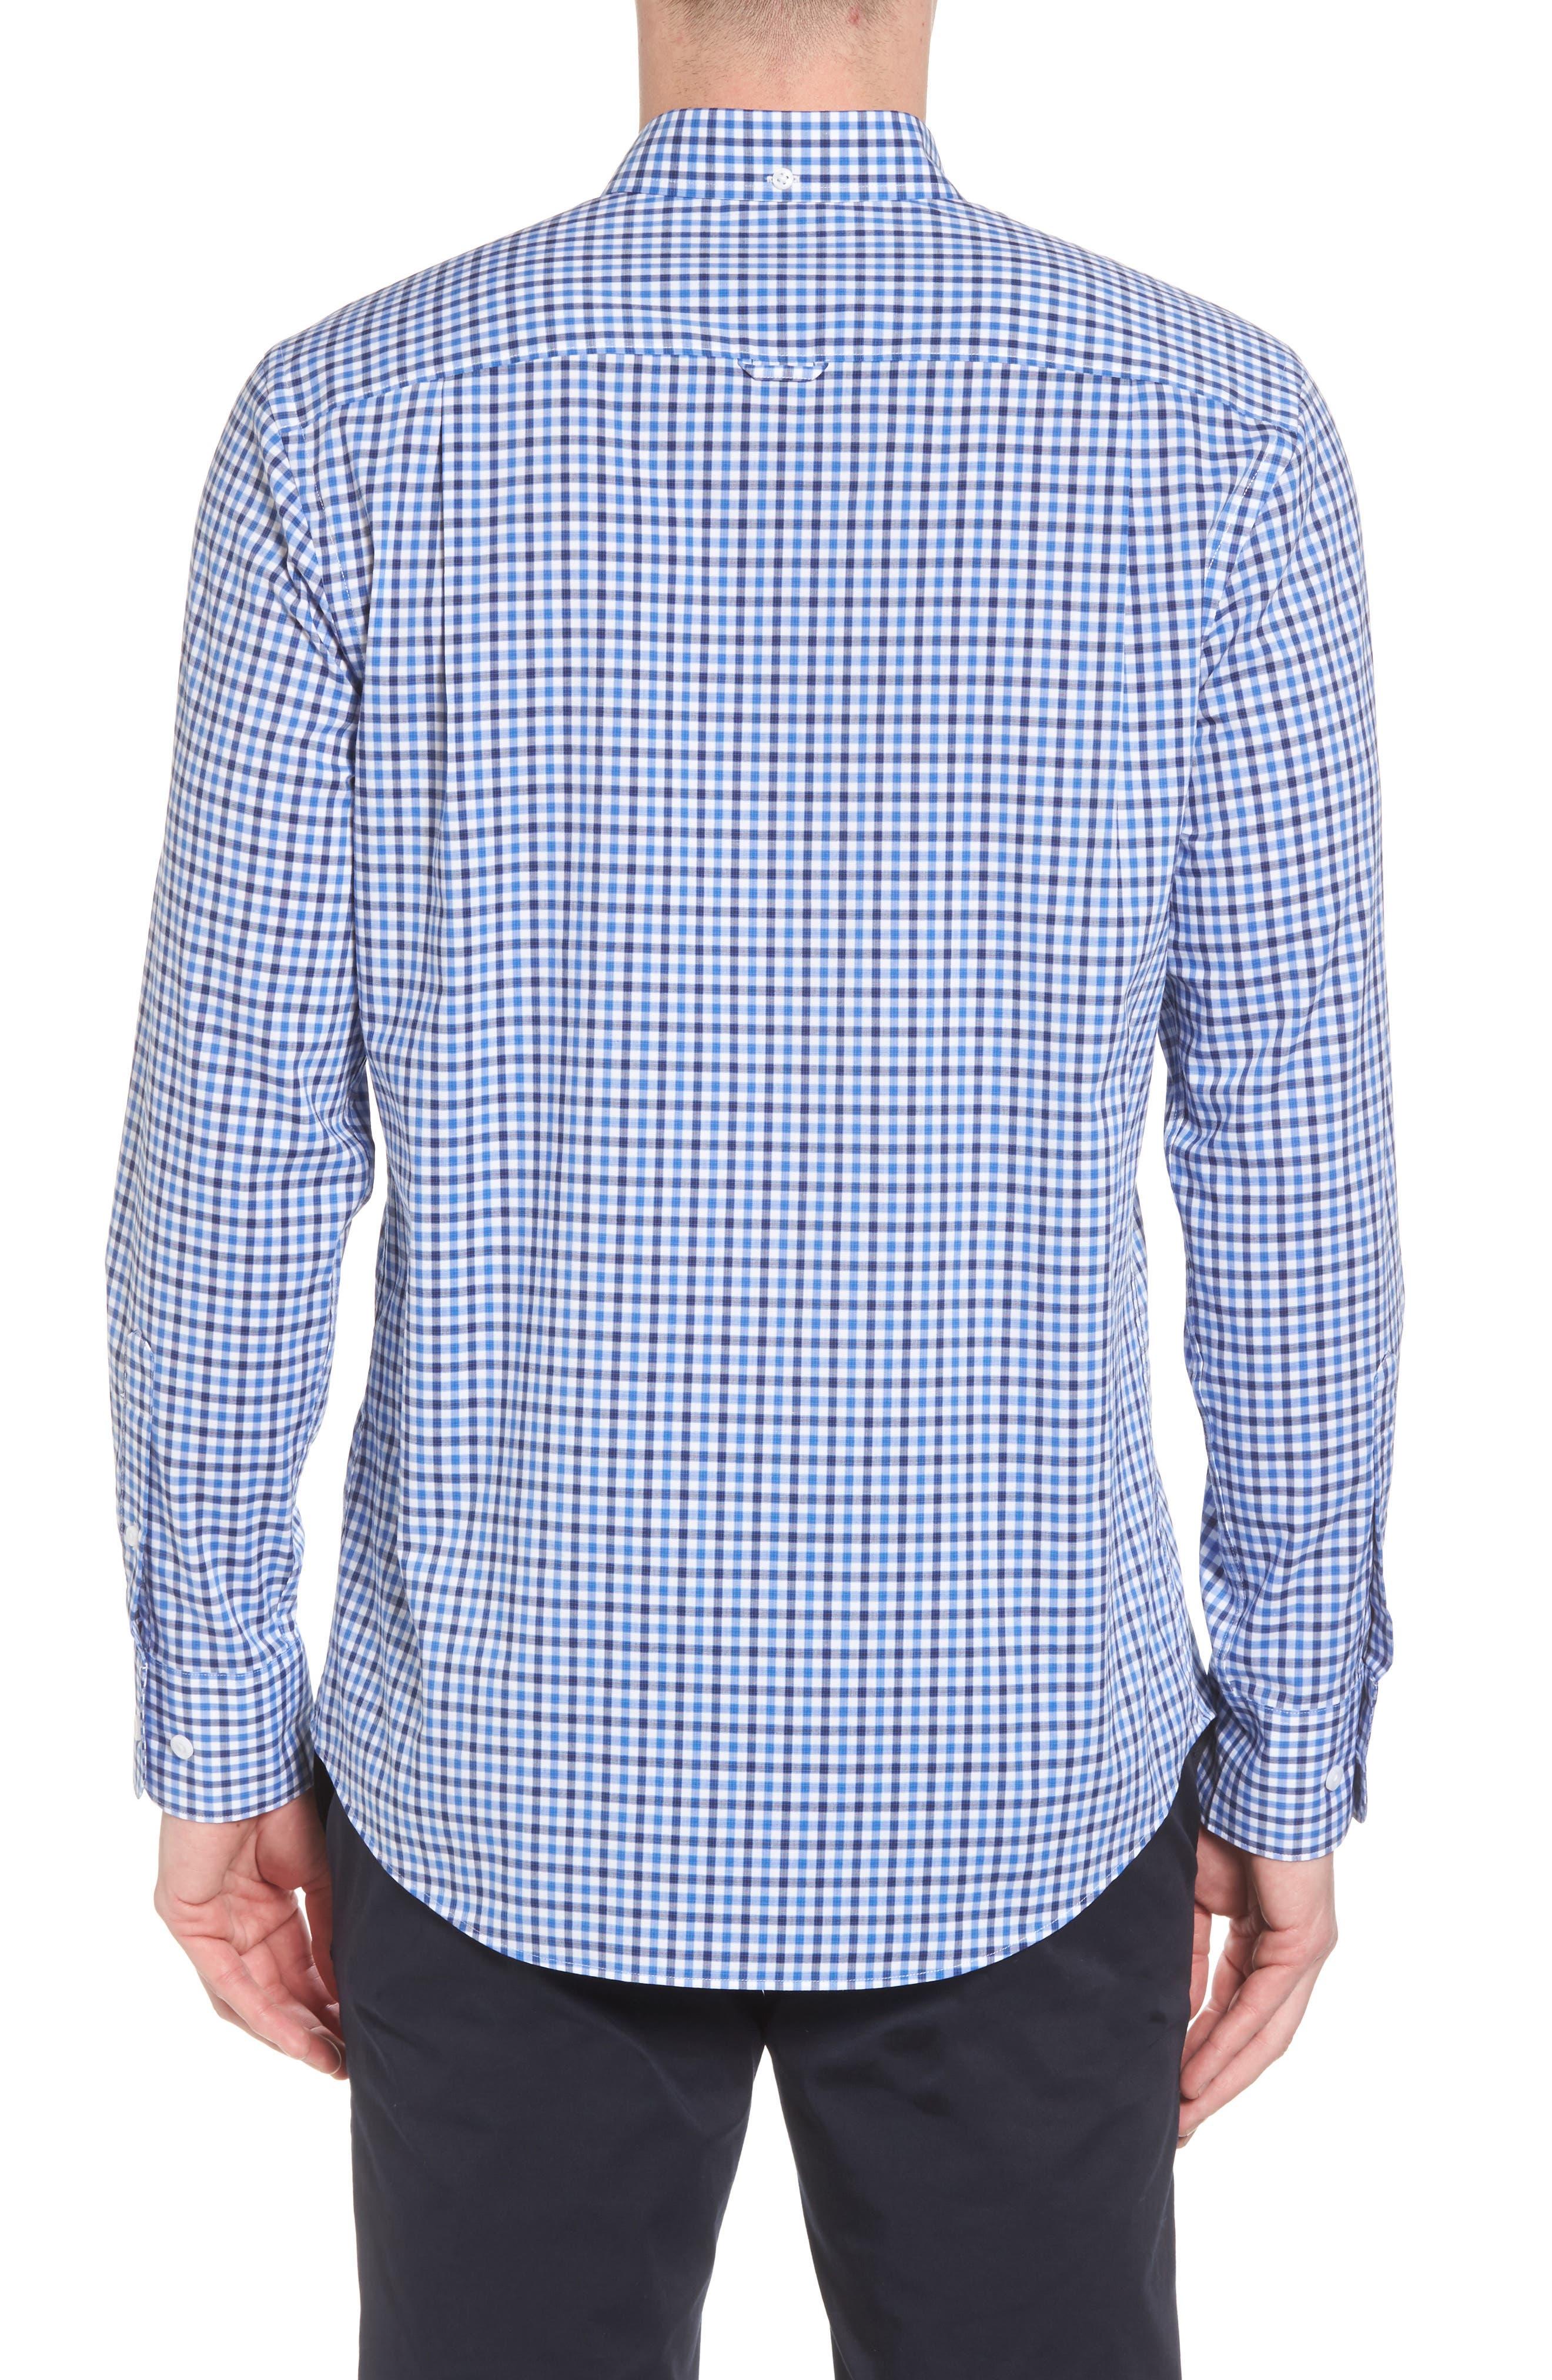 Tech-Smart Regular Fit Check Sport Shirt,                             Alternate thumbnail 3, color,                             Blue Camp Navy Check